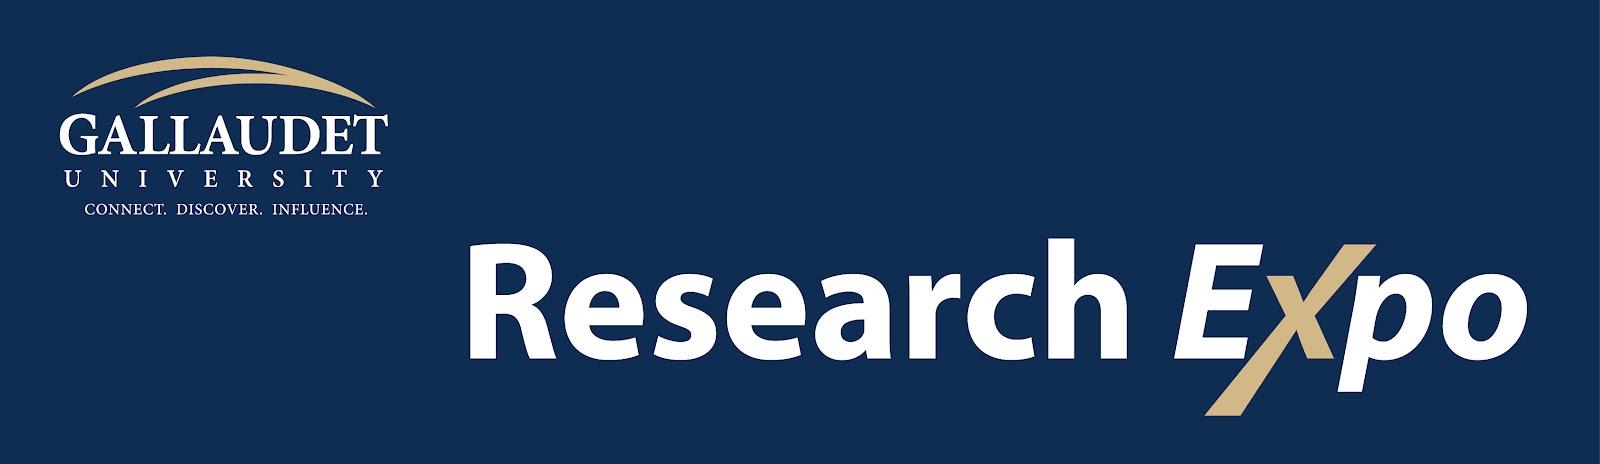 Research Expo Logo